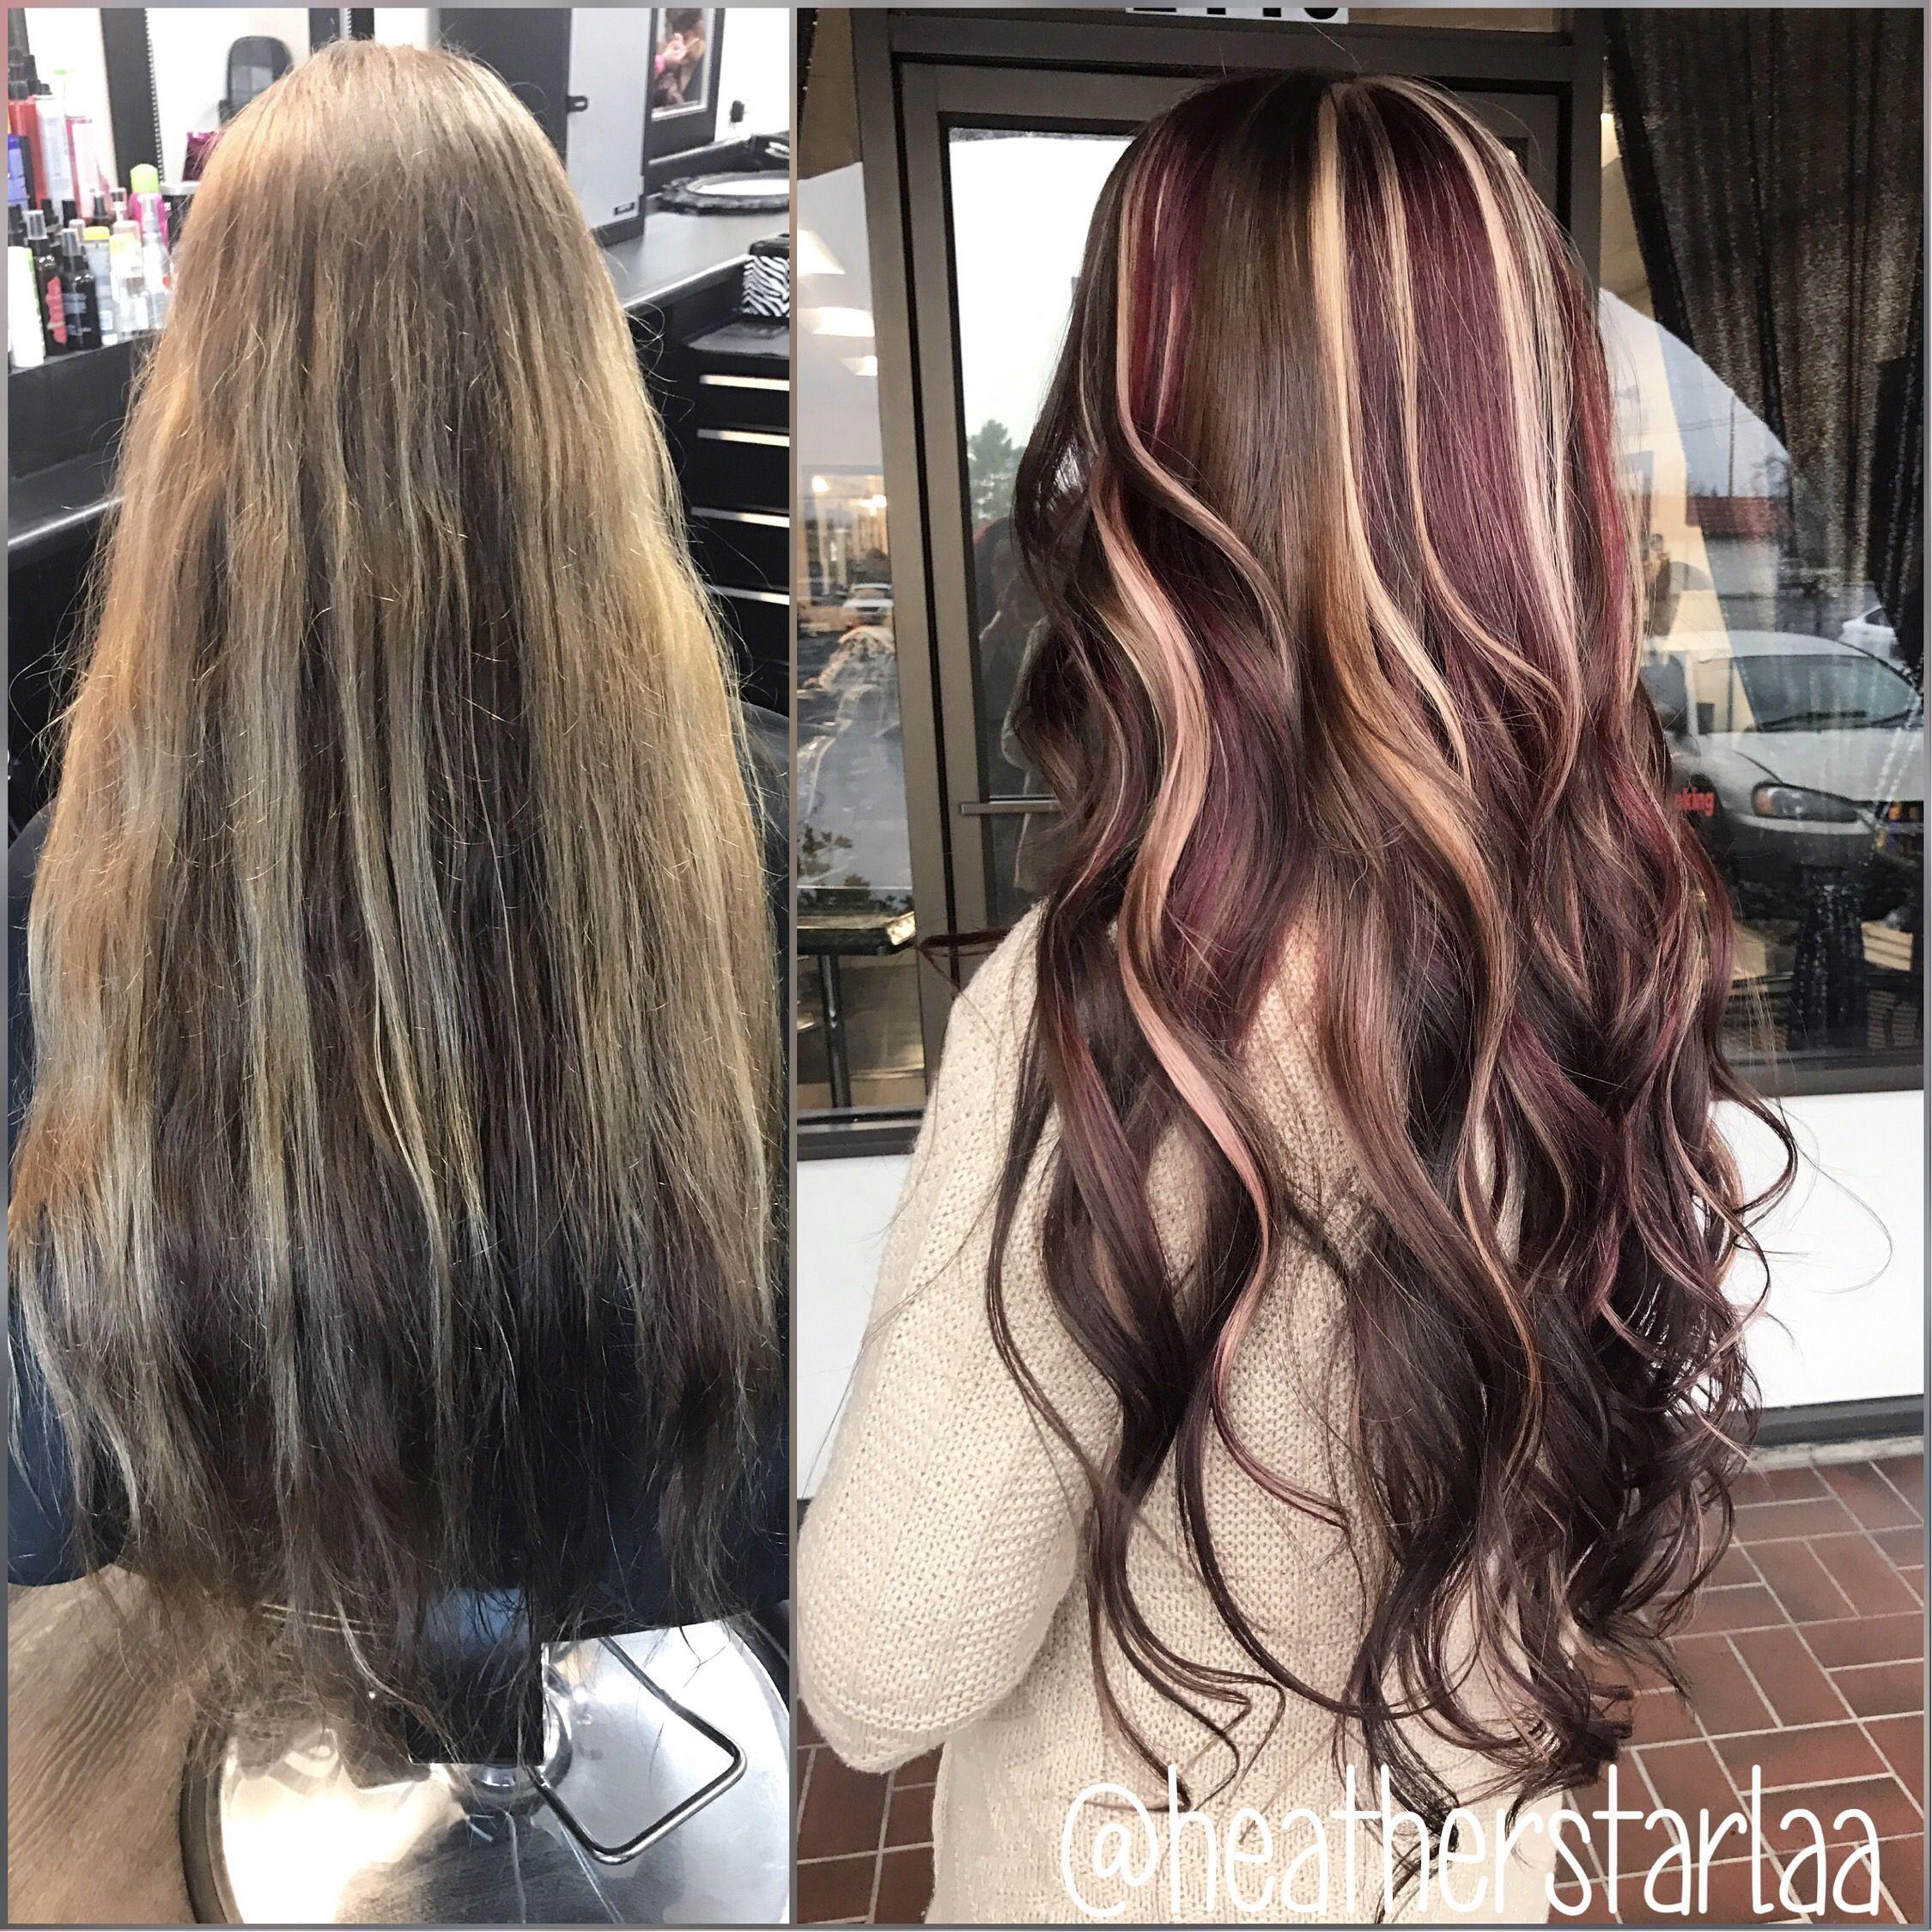 Long Hair Curled Hair Chocolate Brown Hair Red Highlights